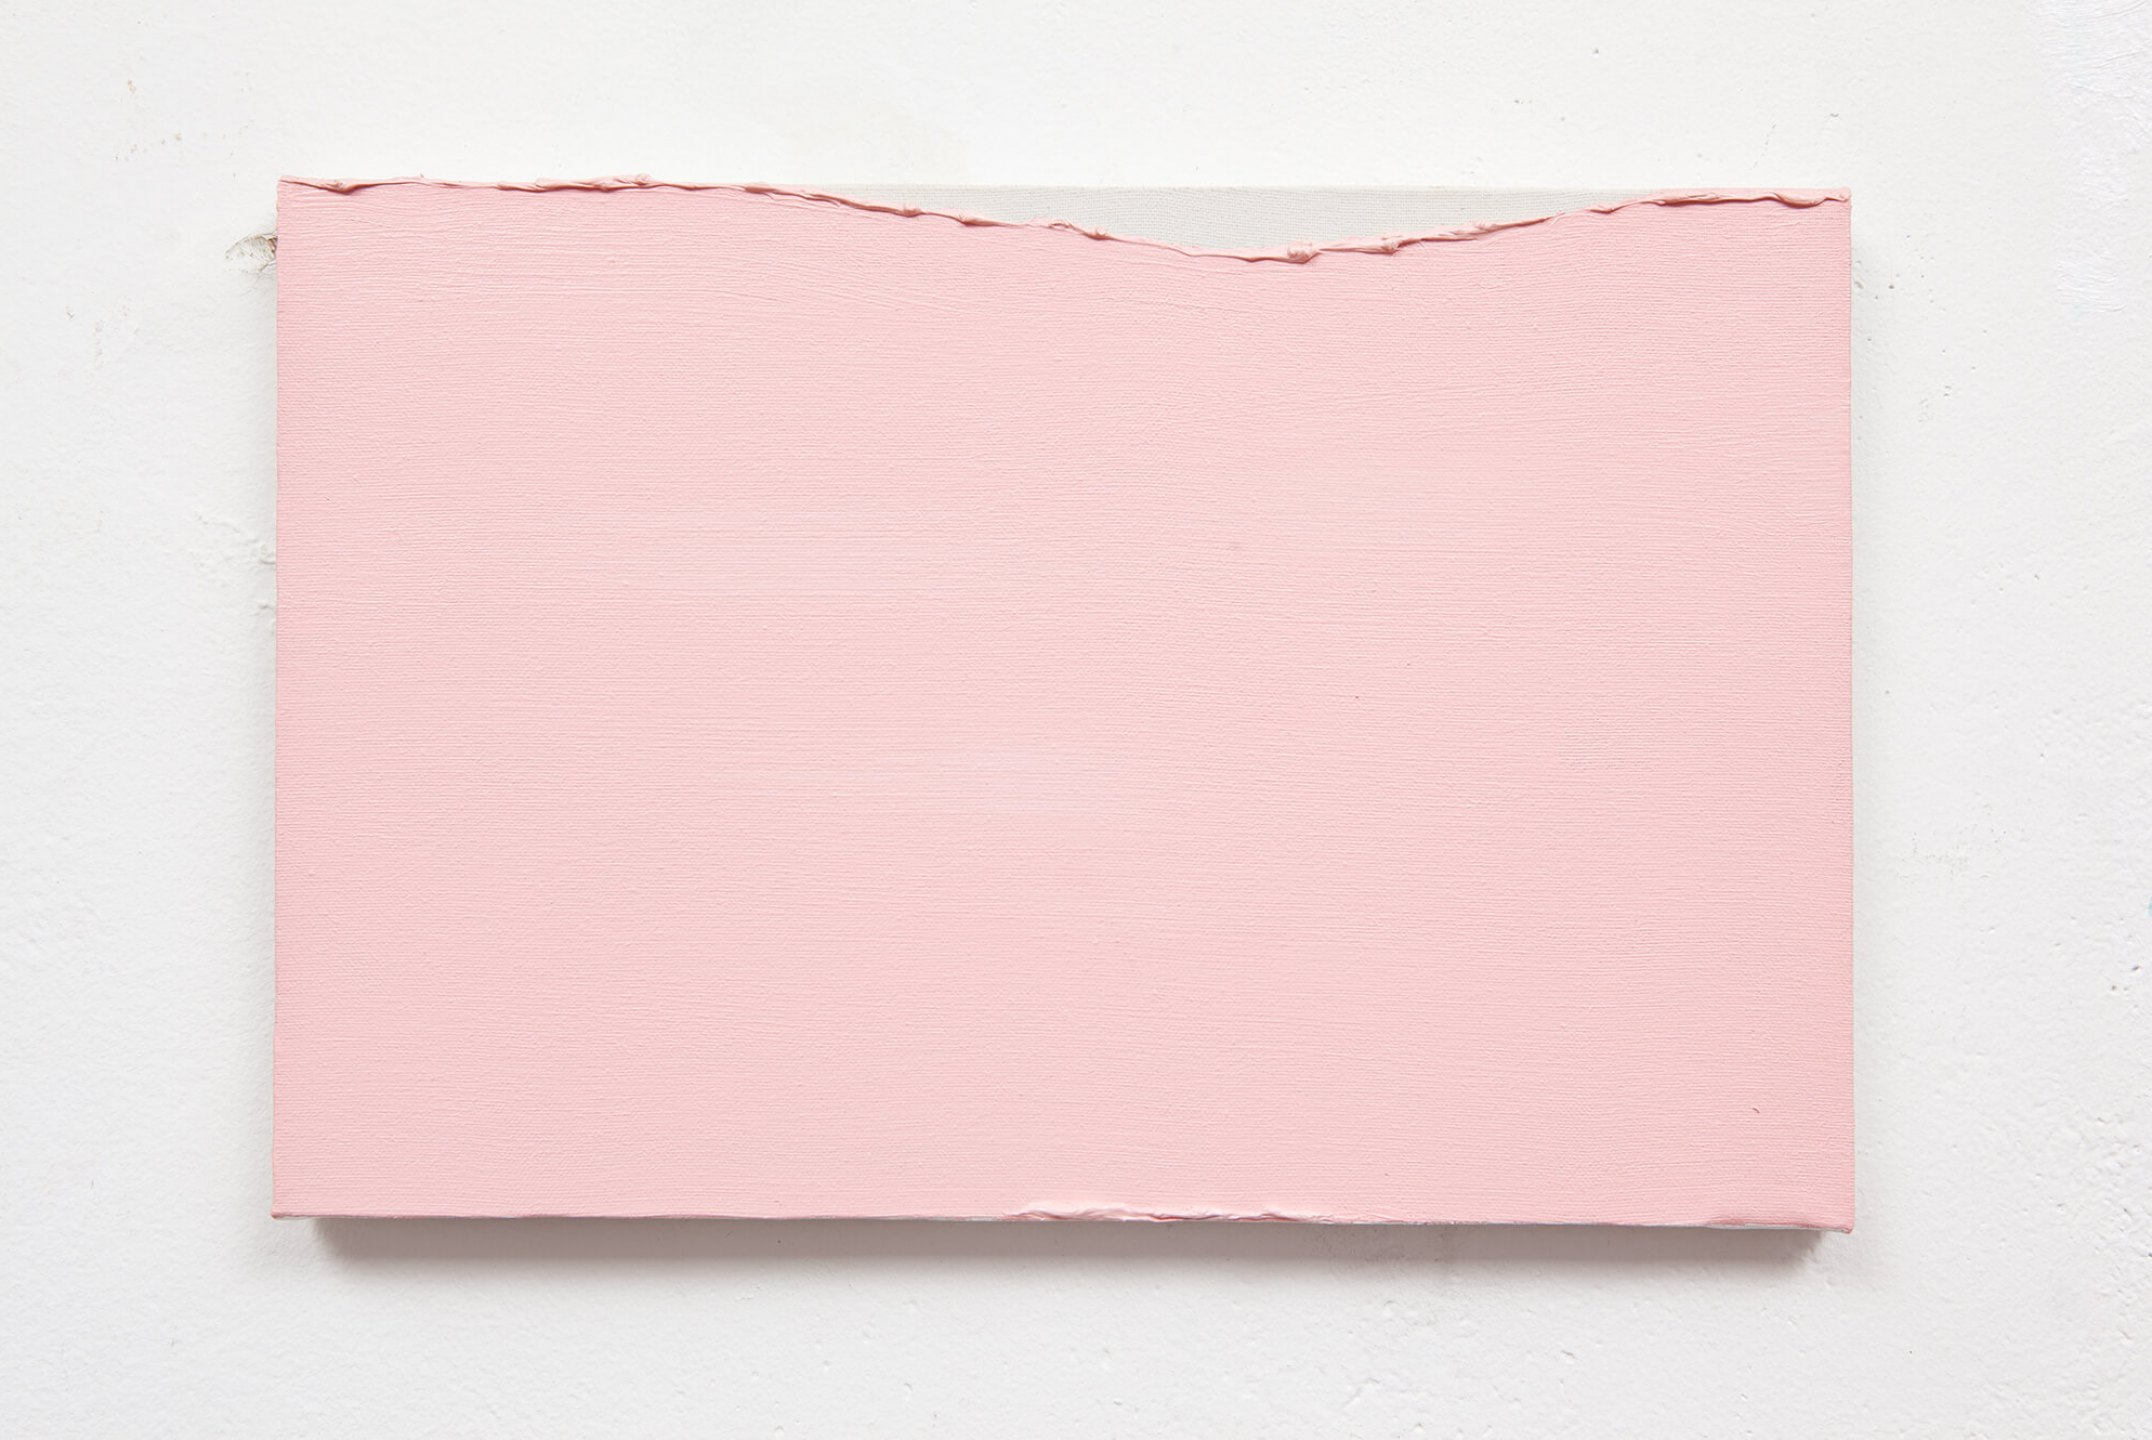 Paulo Monteiro, <em>untitled</em>, 2012, oil on canvas, 20× 30,5 cm - Mendes Wood DM